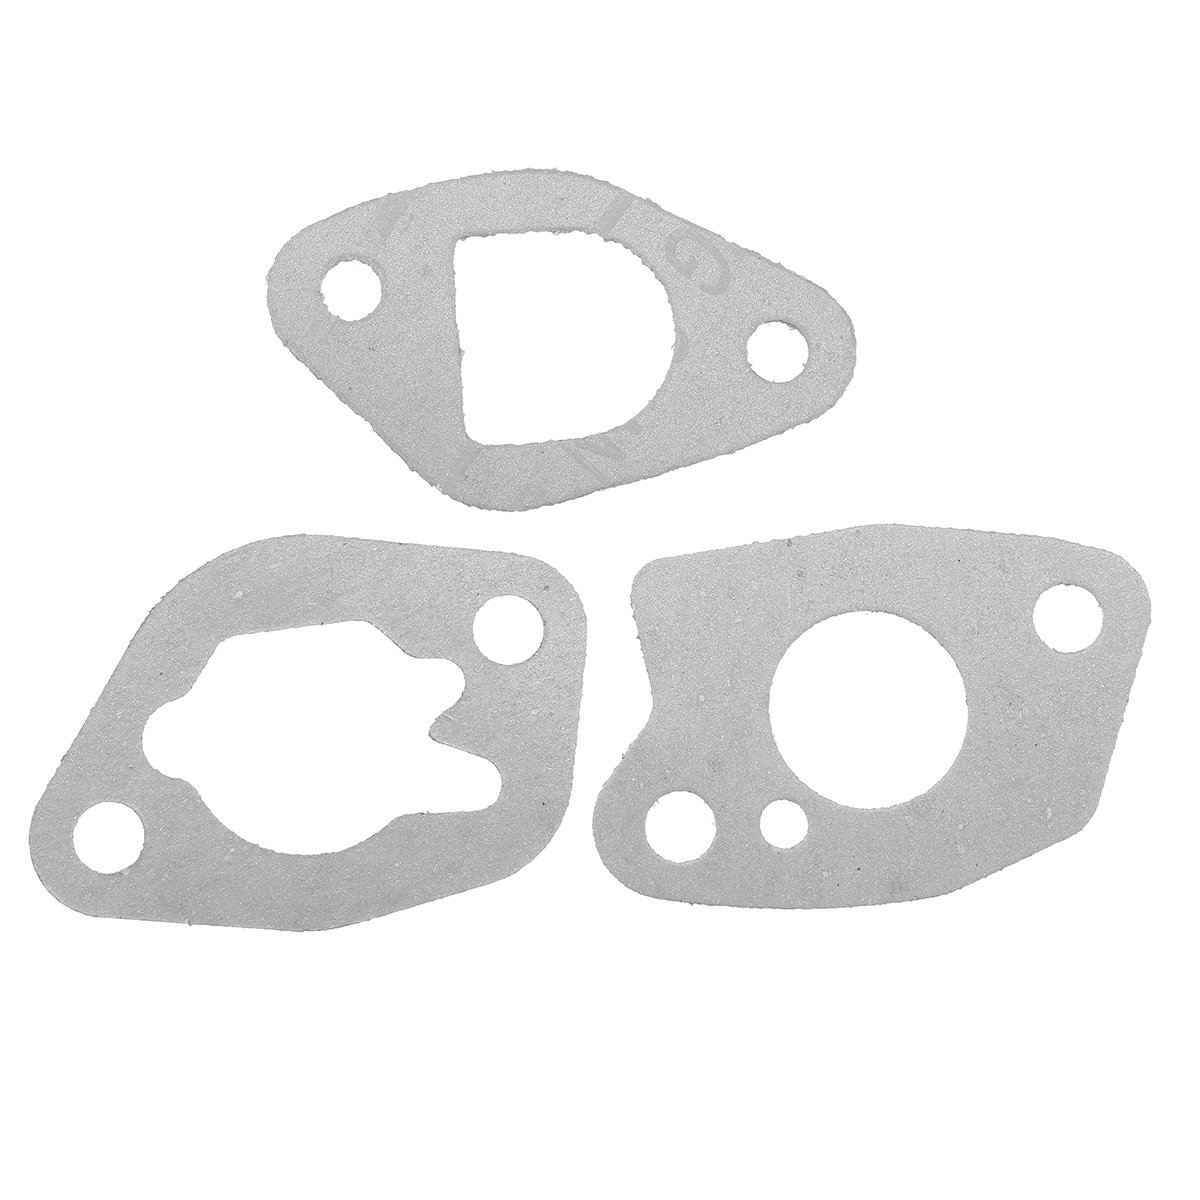 3 Pcs Carburettor Carb gaskets for Subaru Robin EX17 277-62301-30 277-62301-50